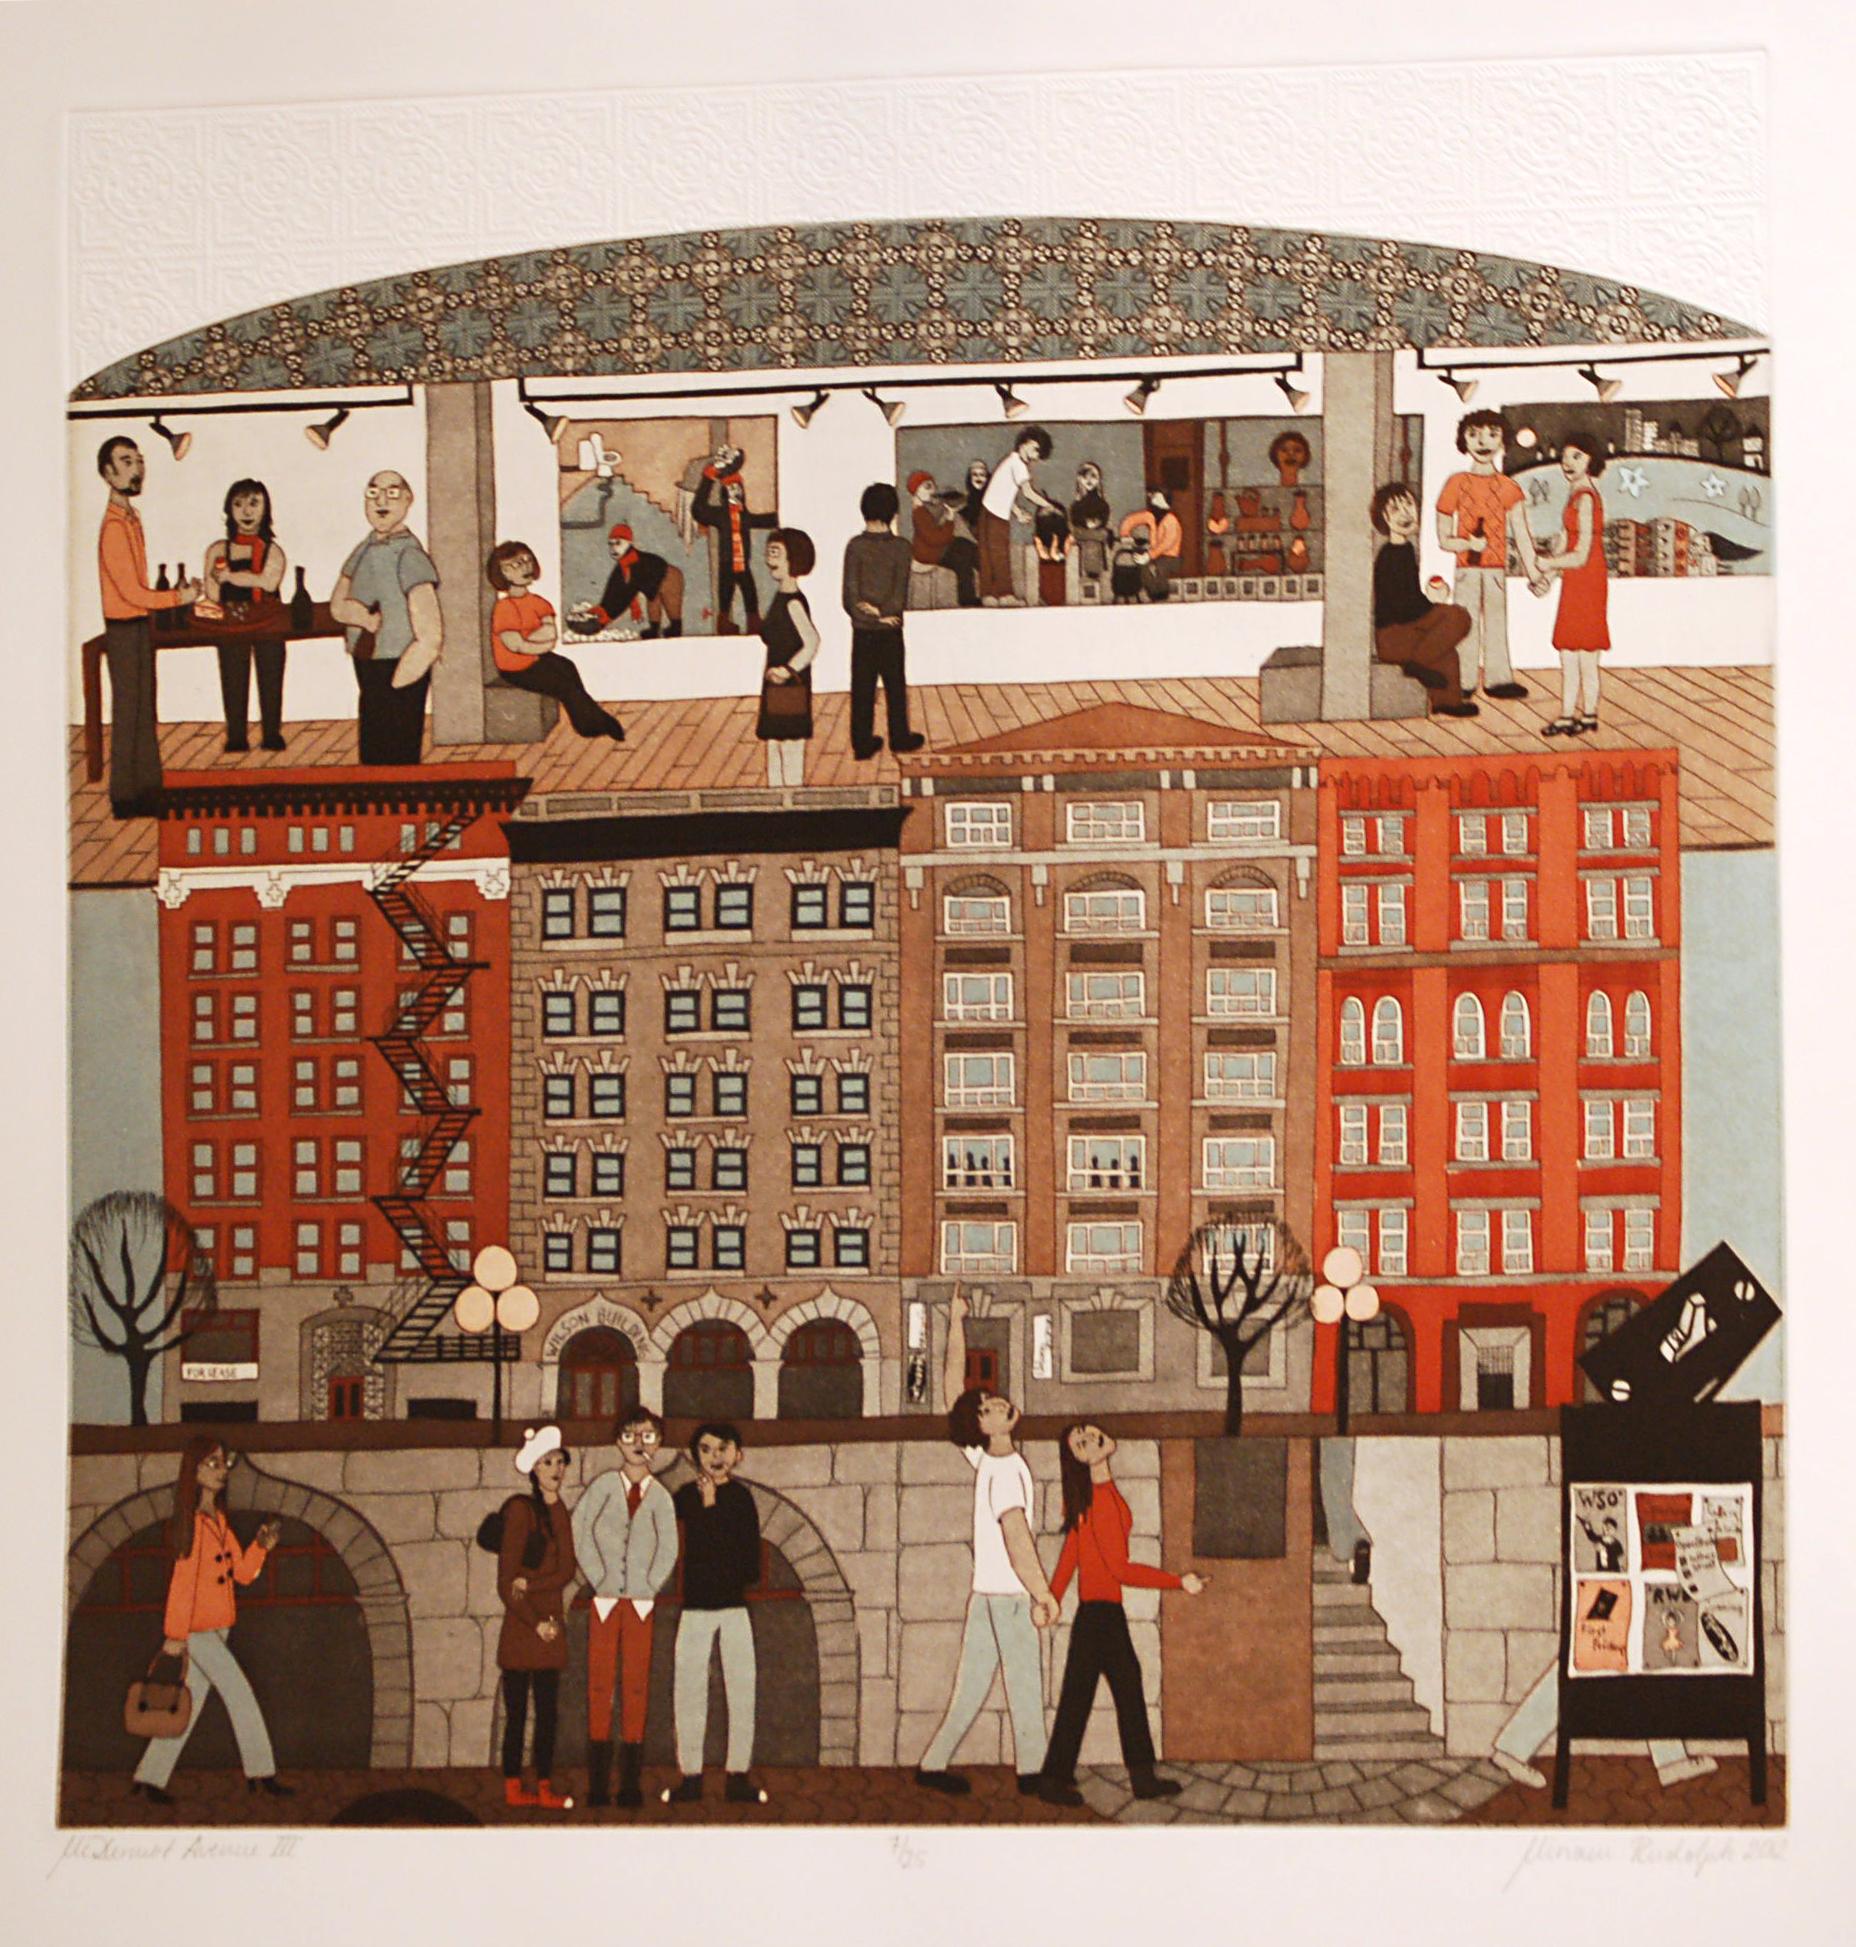 McDermot Avenue, Double Plate Colour Etching Relief Roll through Stencil, 45.5cm x 45.5cm, 2012